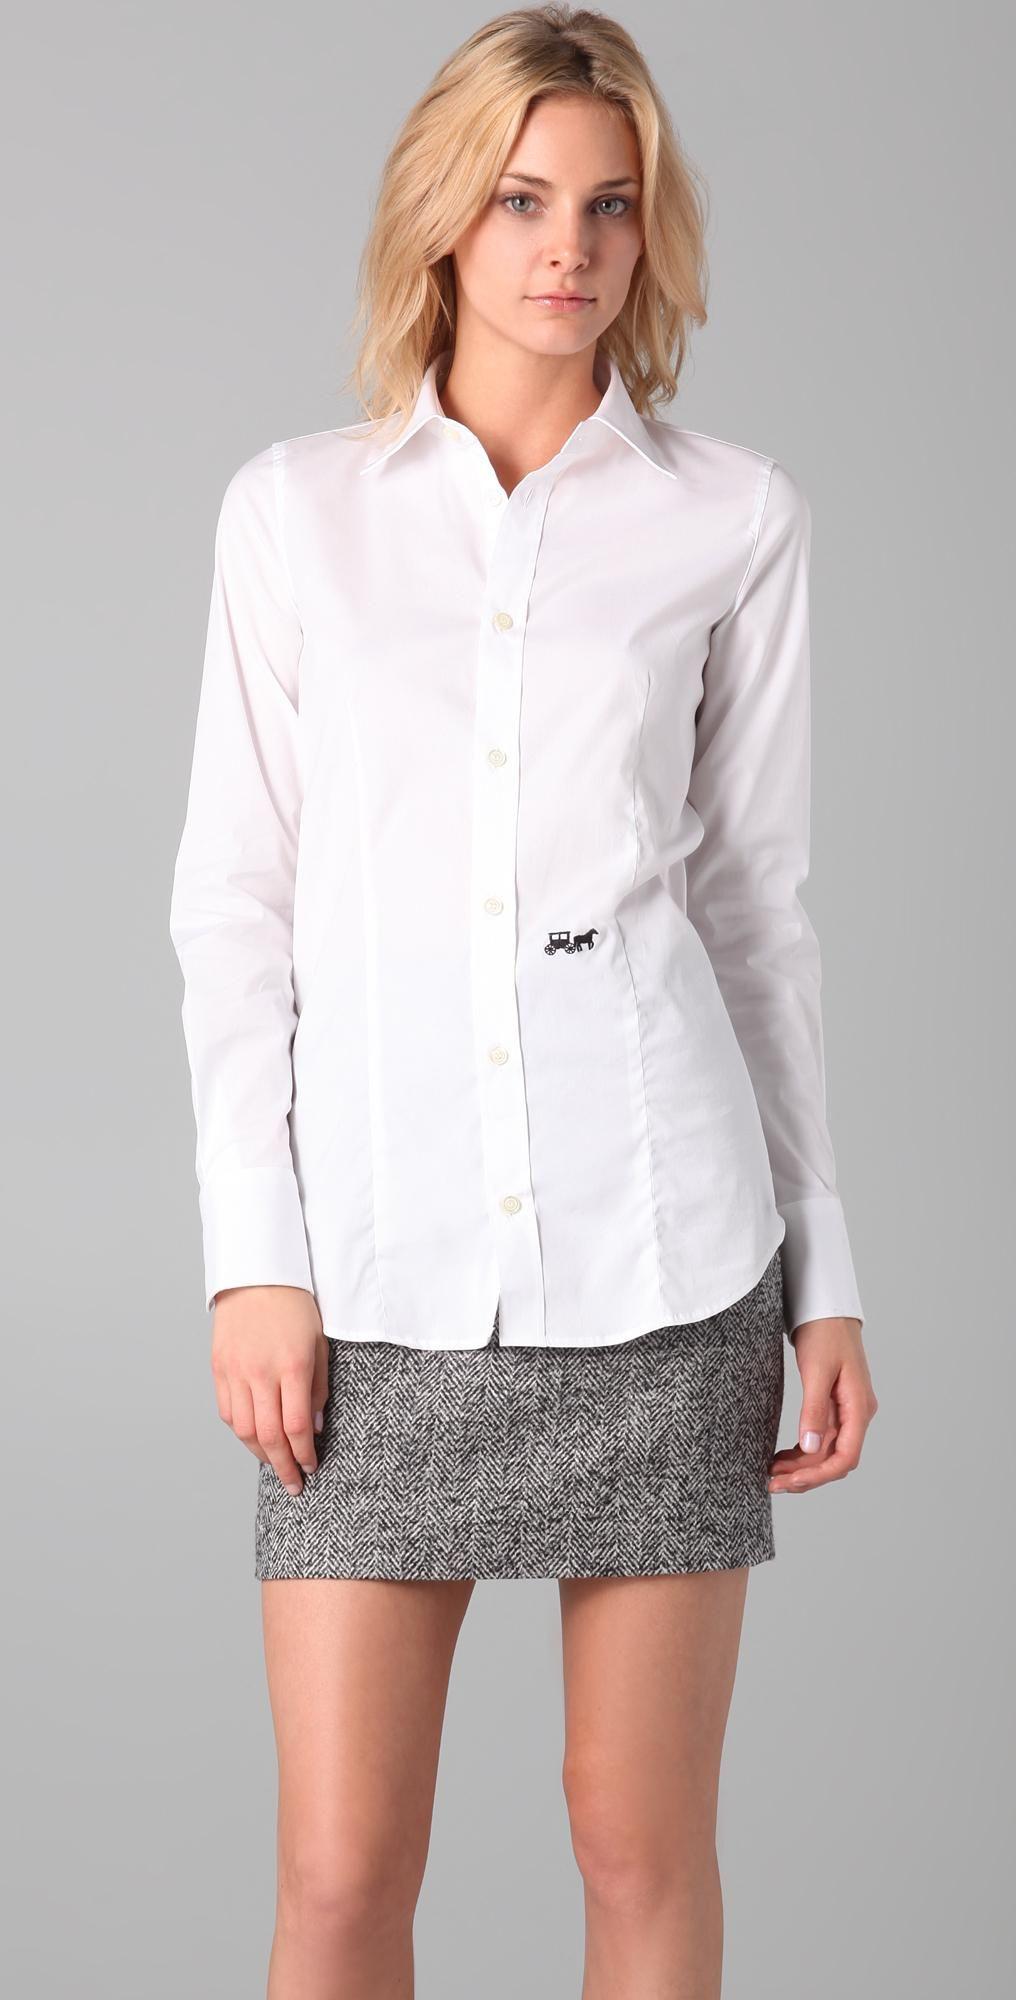 Dsquared2 white classic poplin shirt buttondown top size